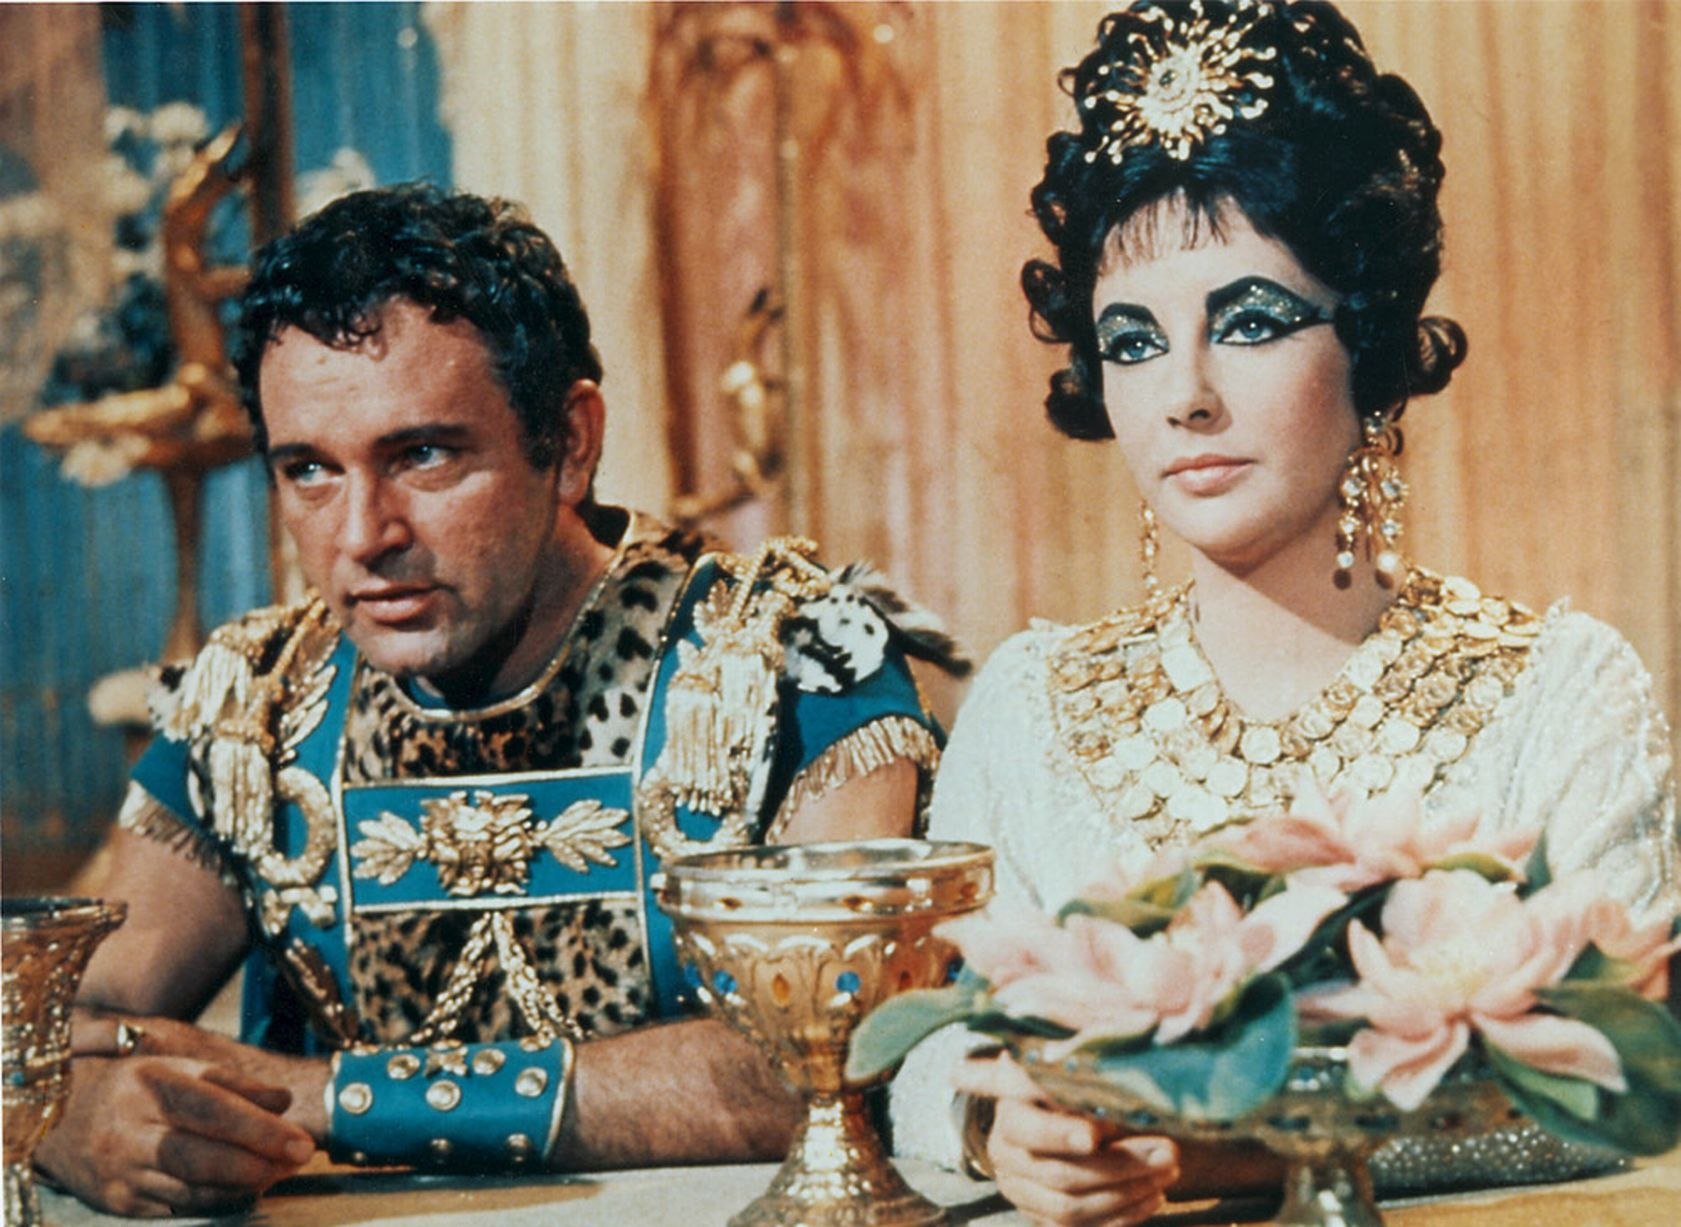 CLEOPATRA Elizabeth Taylor 1963 The Remarkable Life Of Richard Burton